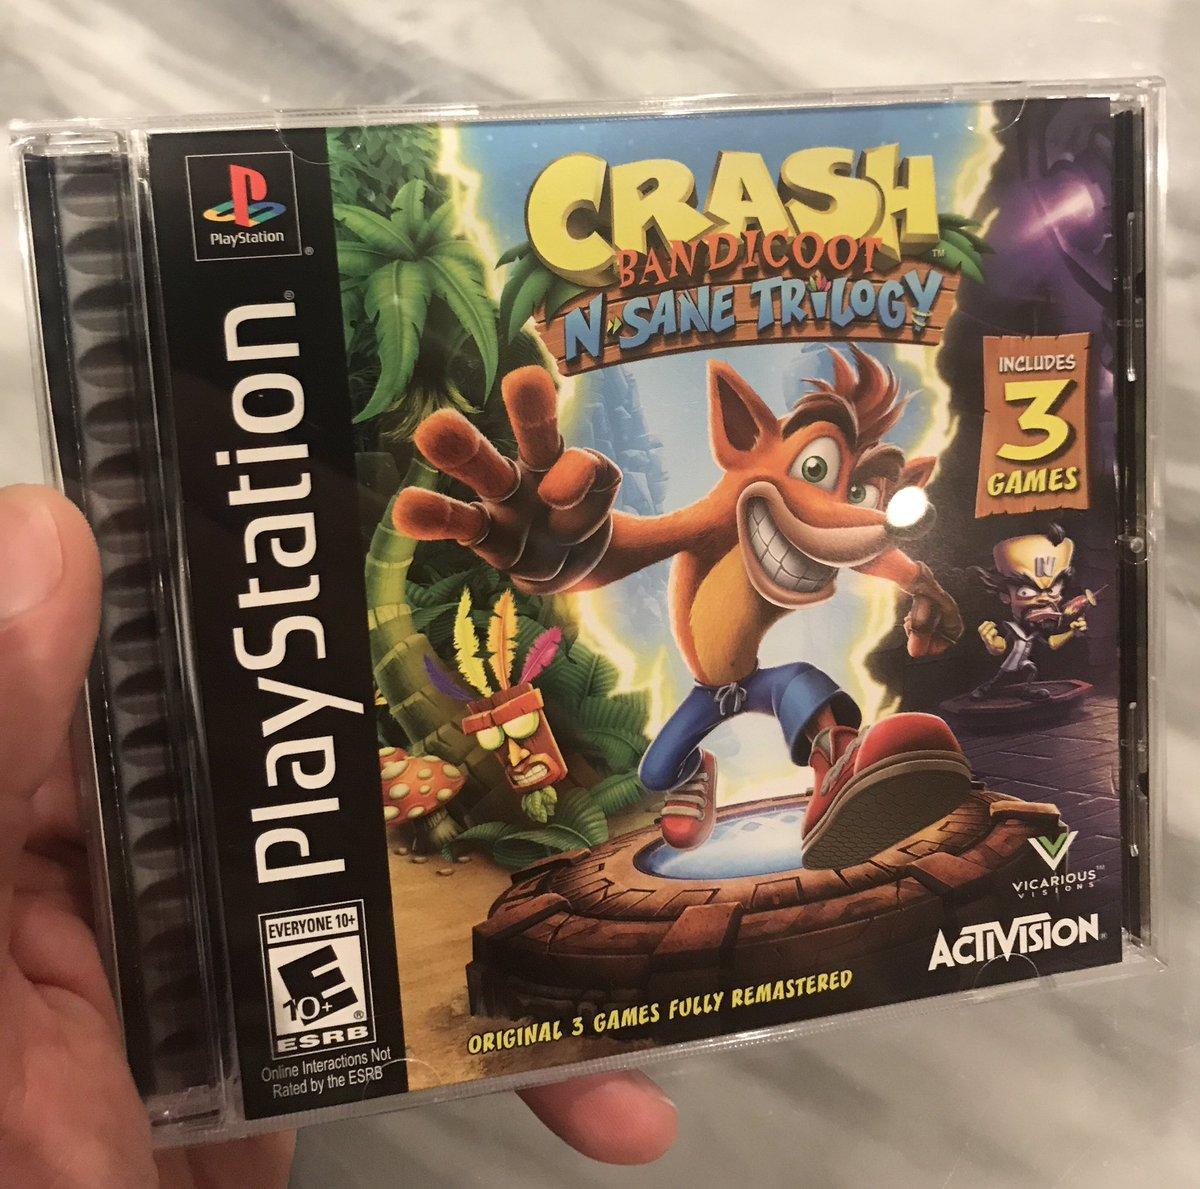 PlayStation employees got a way cooler case for Crash Bandicoot N. Sane Trilogy screenshot